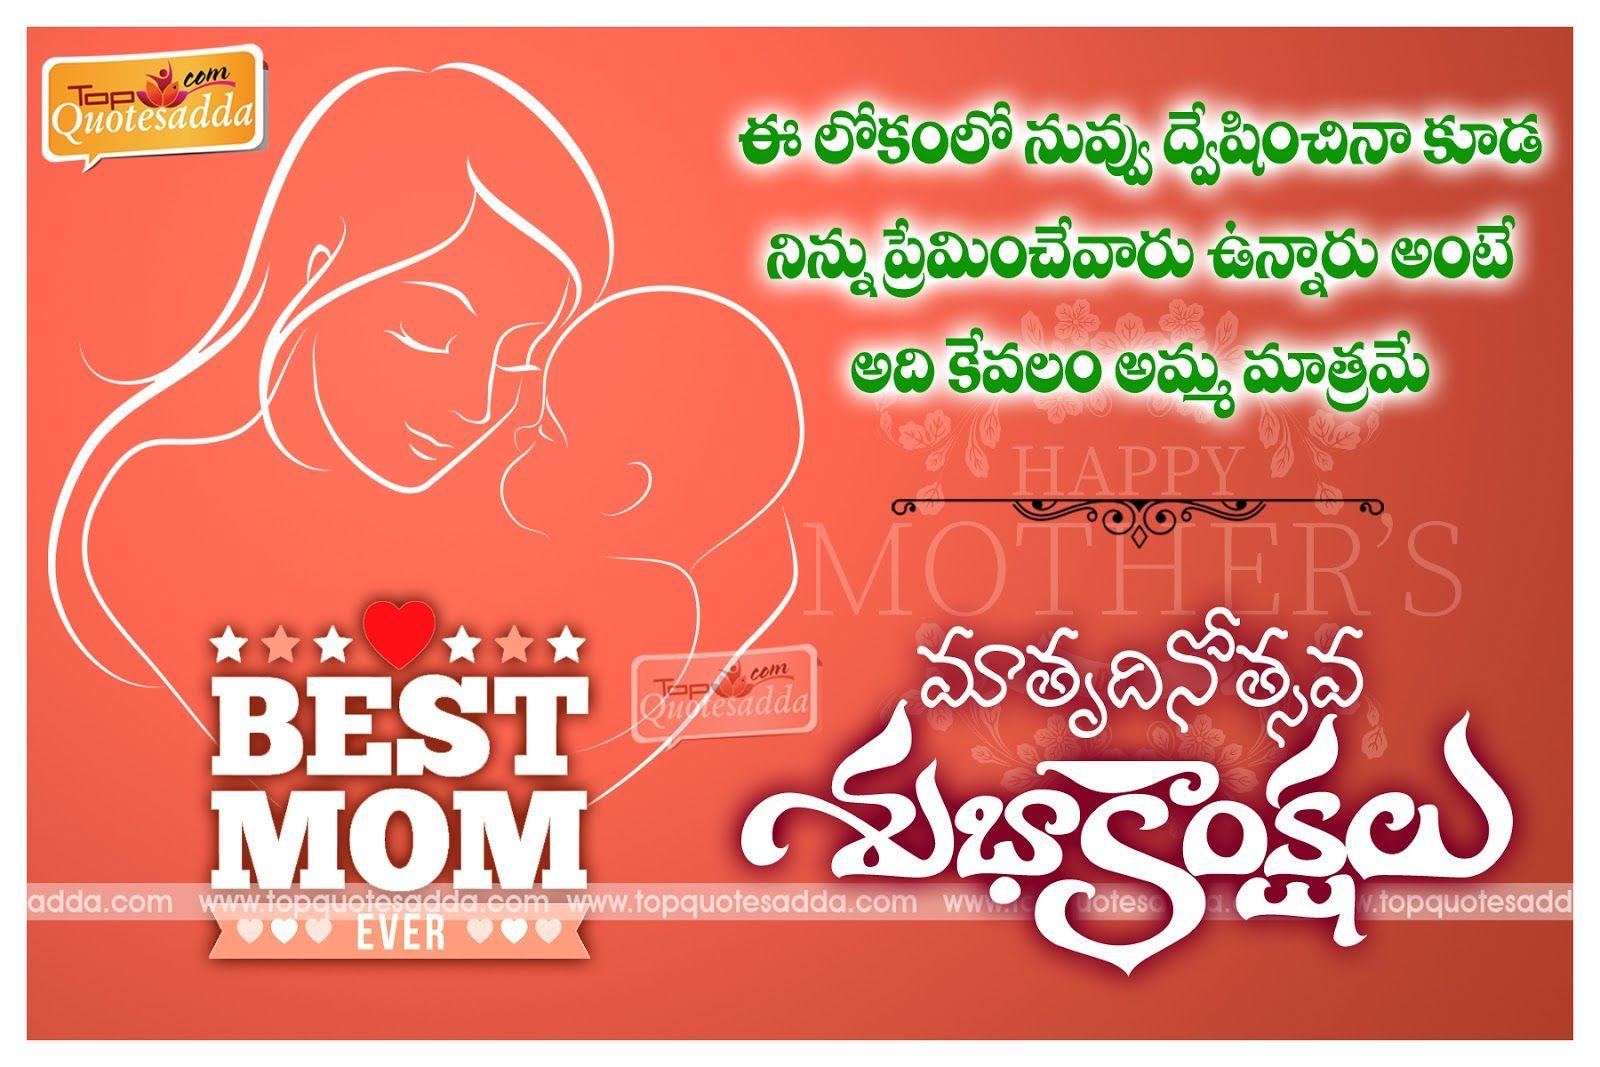 Topquotesadda Telugu Quotes Hindi Quotes Tamil Bengali Quotes Happy Mothers Day Happy Mother Day Quotes Mothers Day Quotes Happy Mothers Day Messages